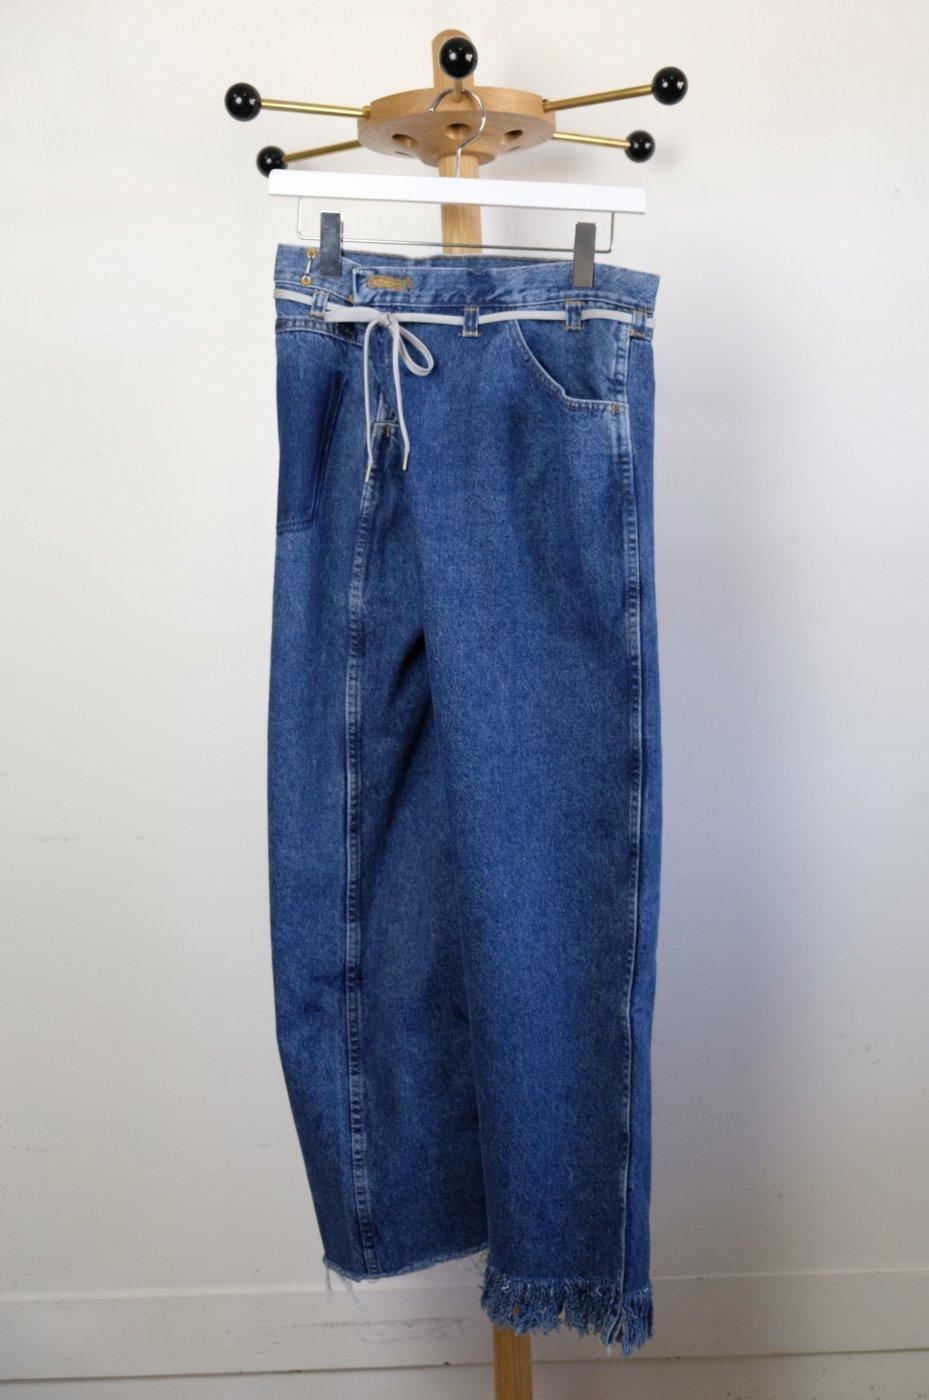 MAISON EUREKA メゾンエウレカ-VINTAGE REWORK BIGGY PANTS-BLUE-#3